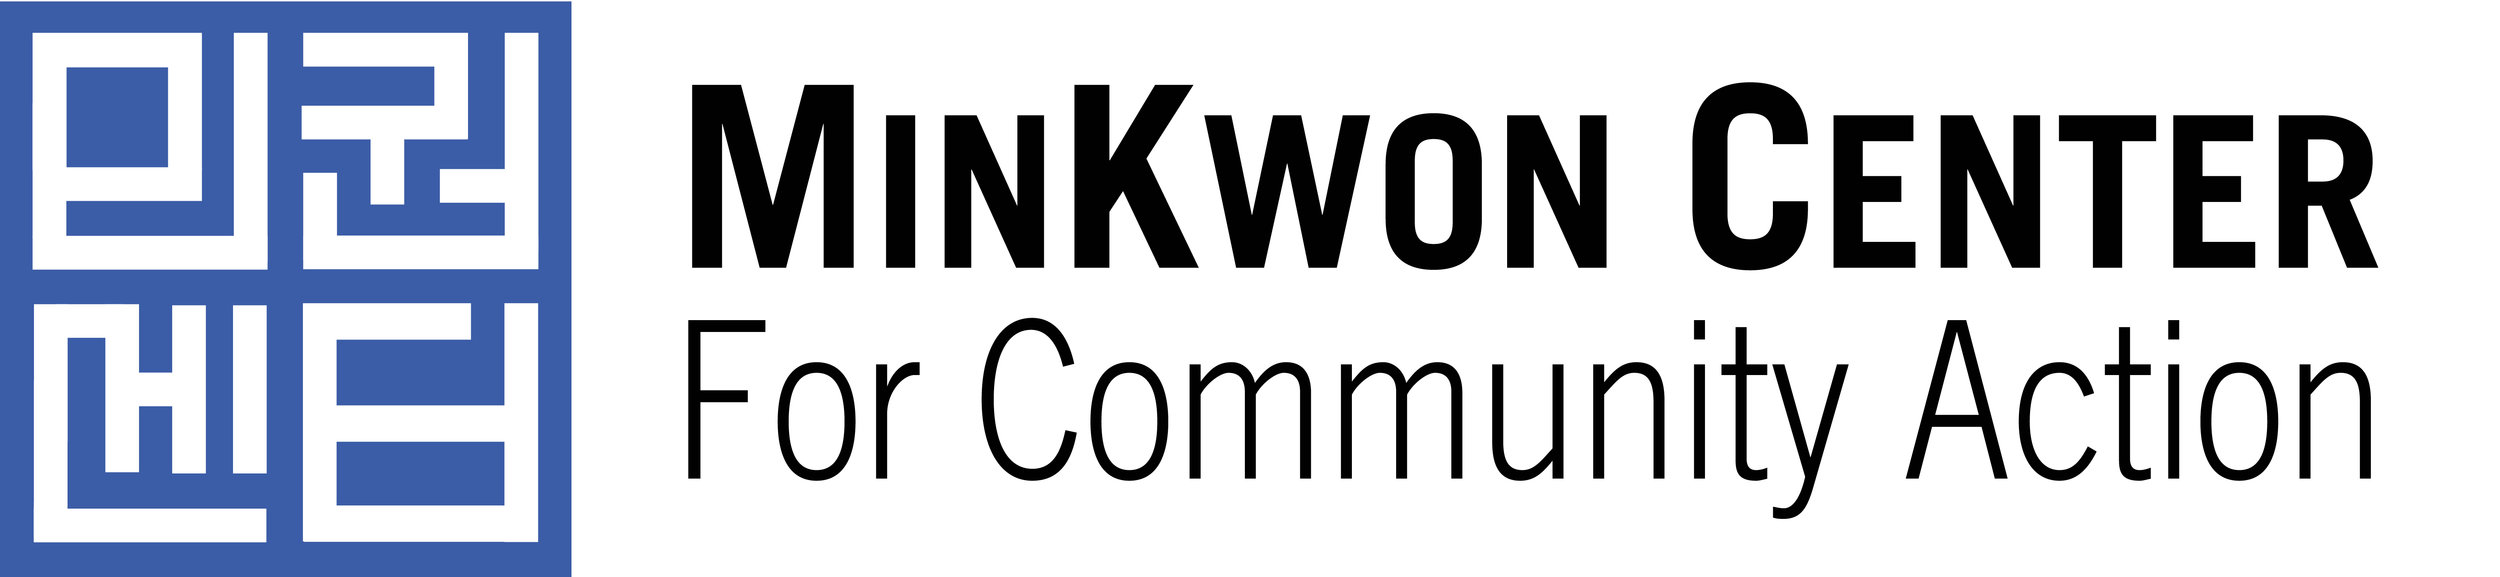 MinKwon Center Official High-Resolution Logo.jpg